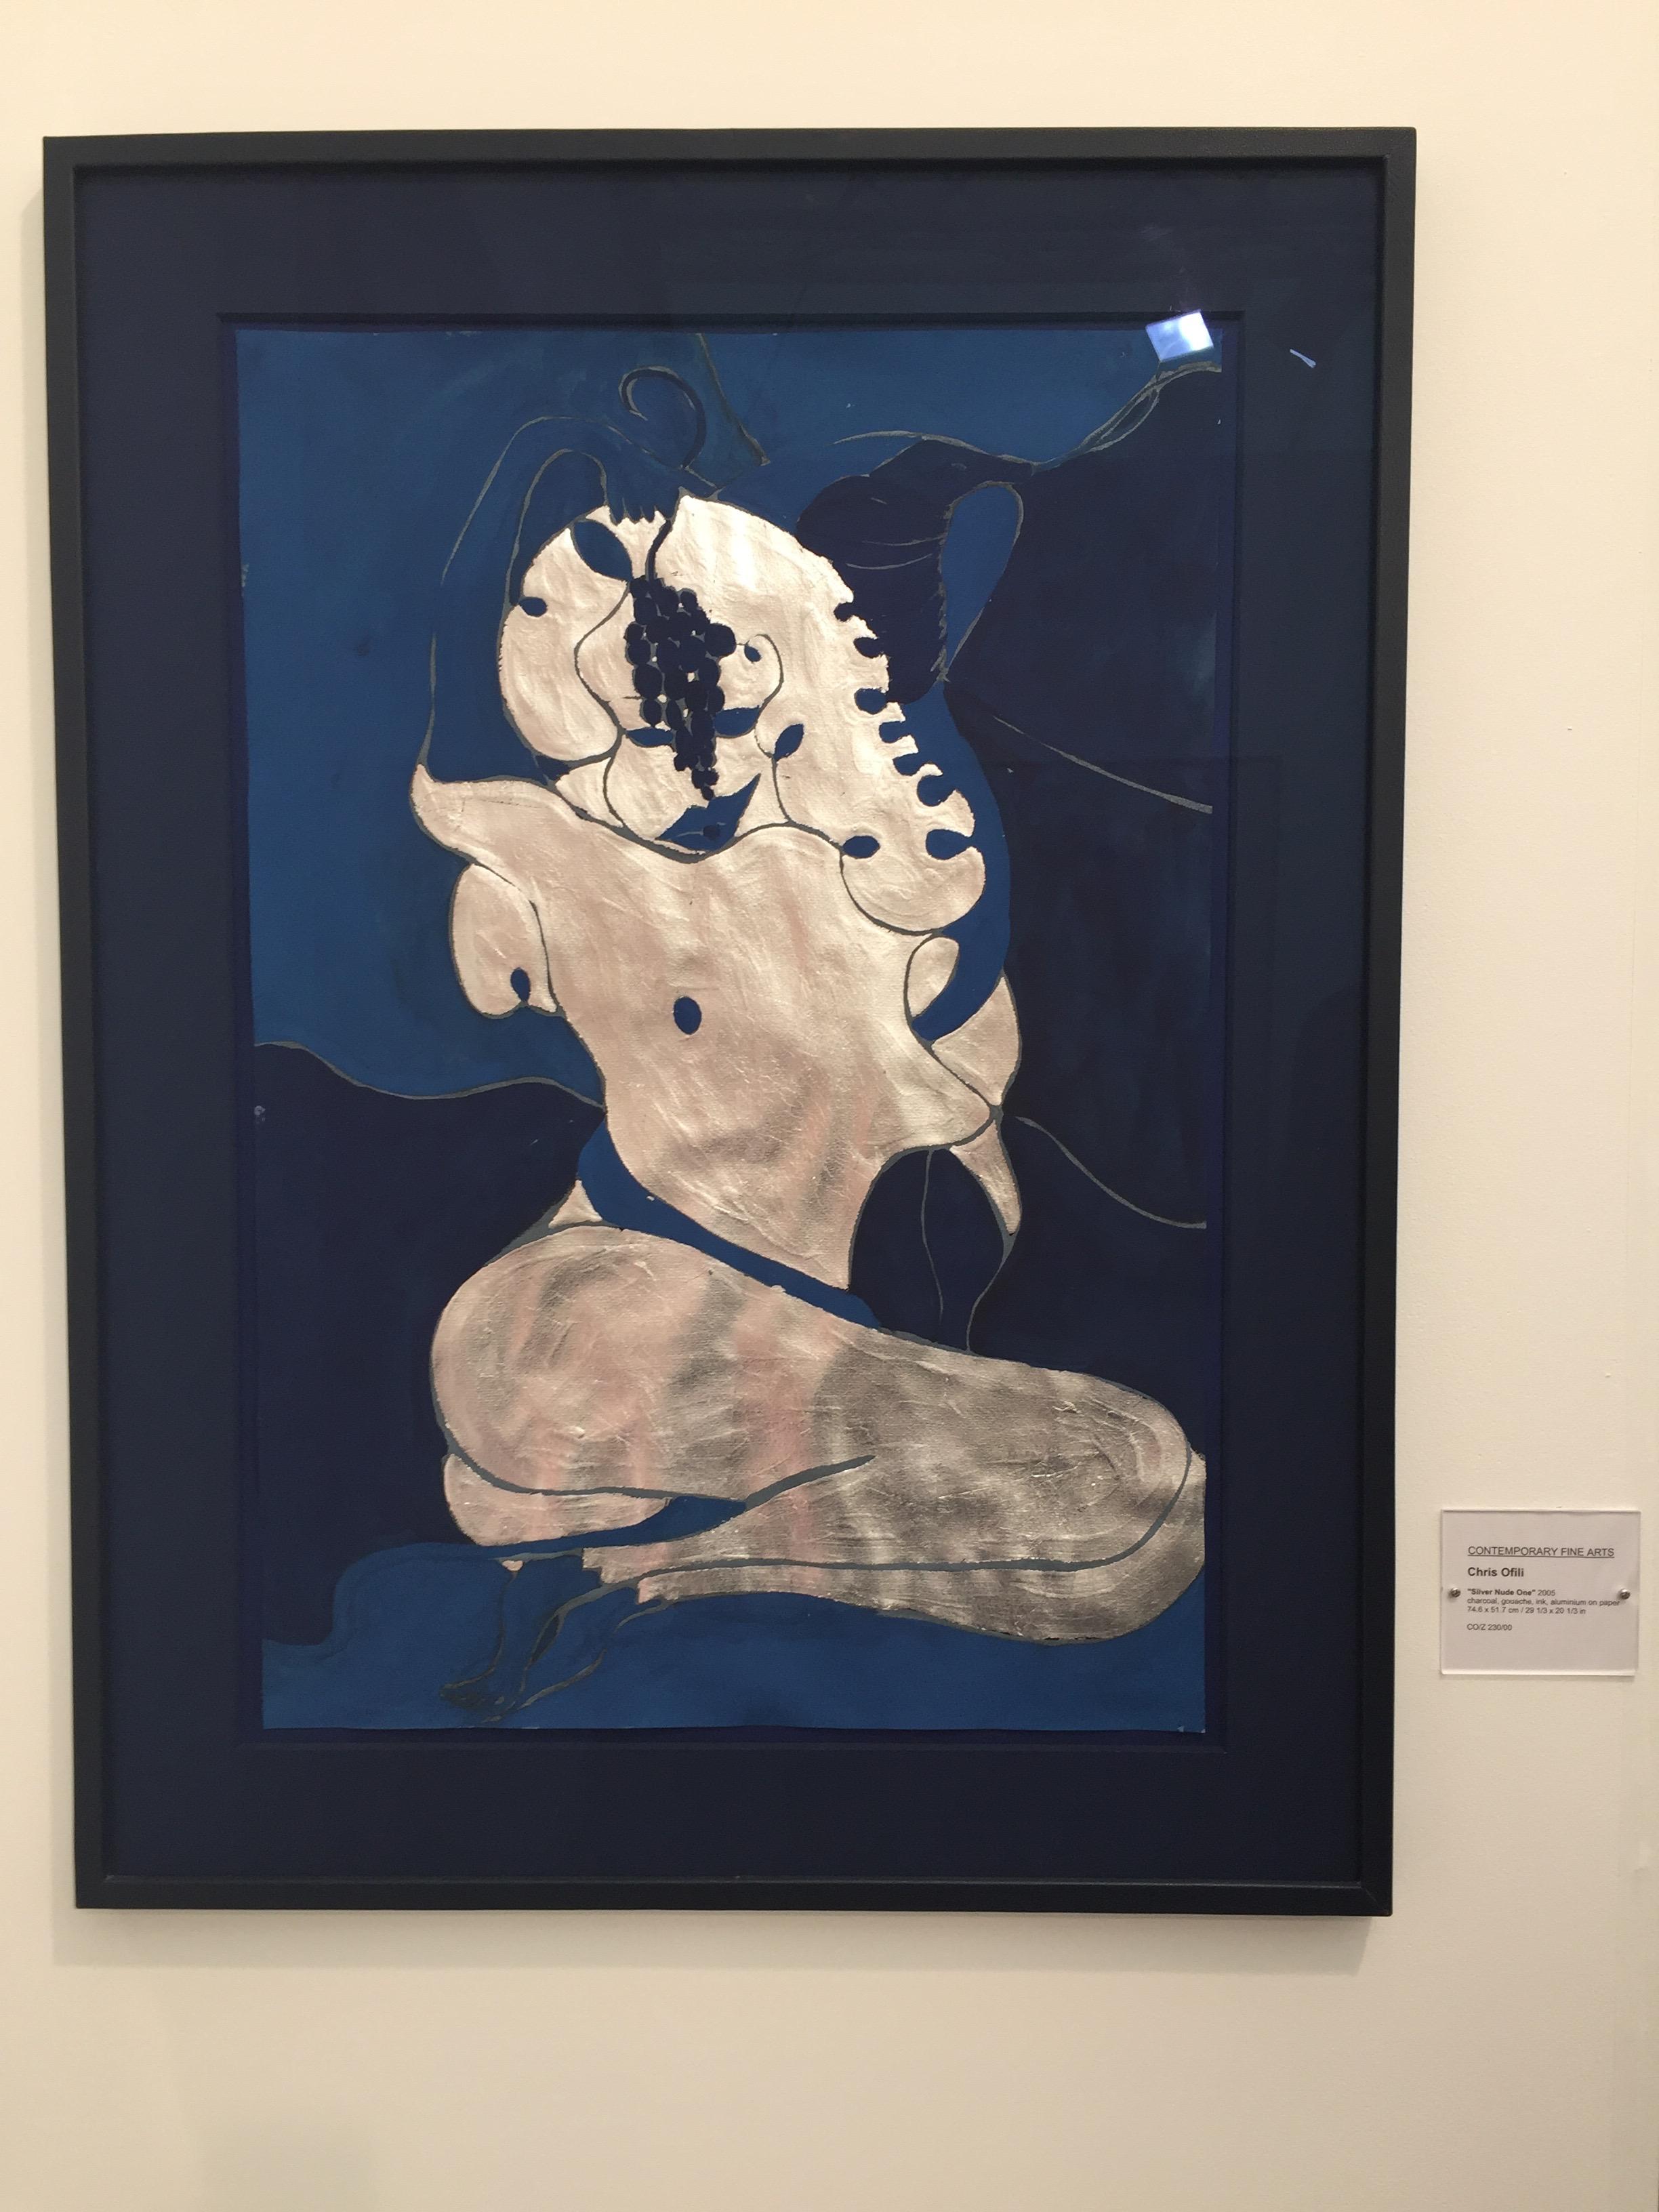 Chris Ofili's Silver Nude One, 2005